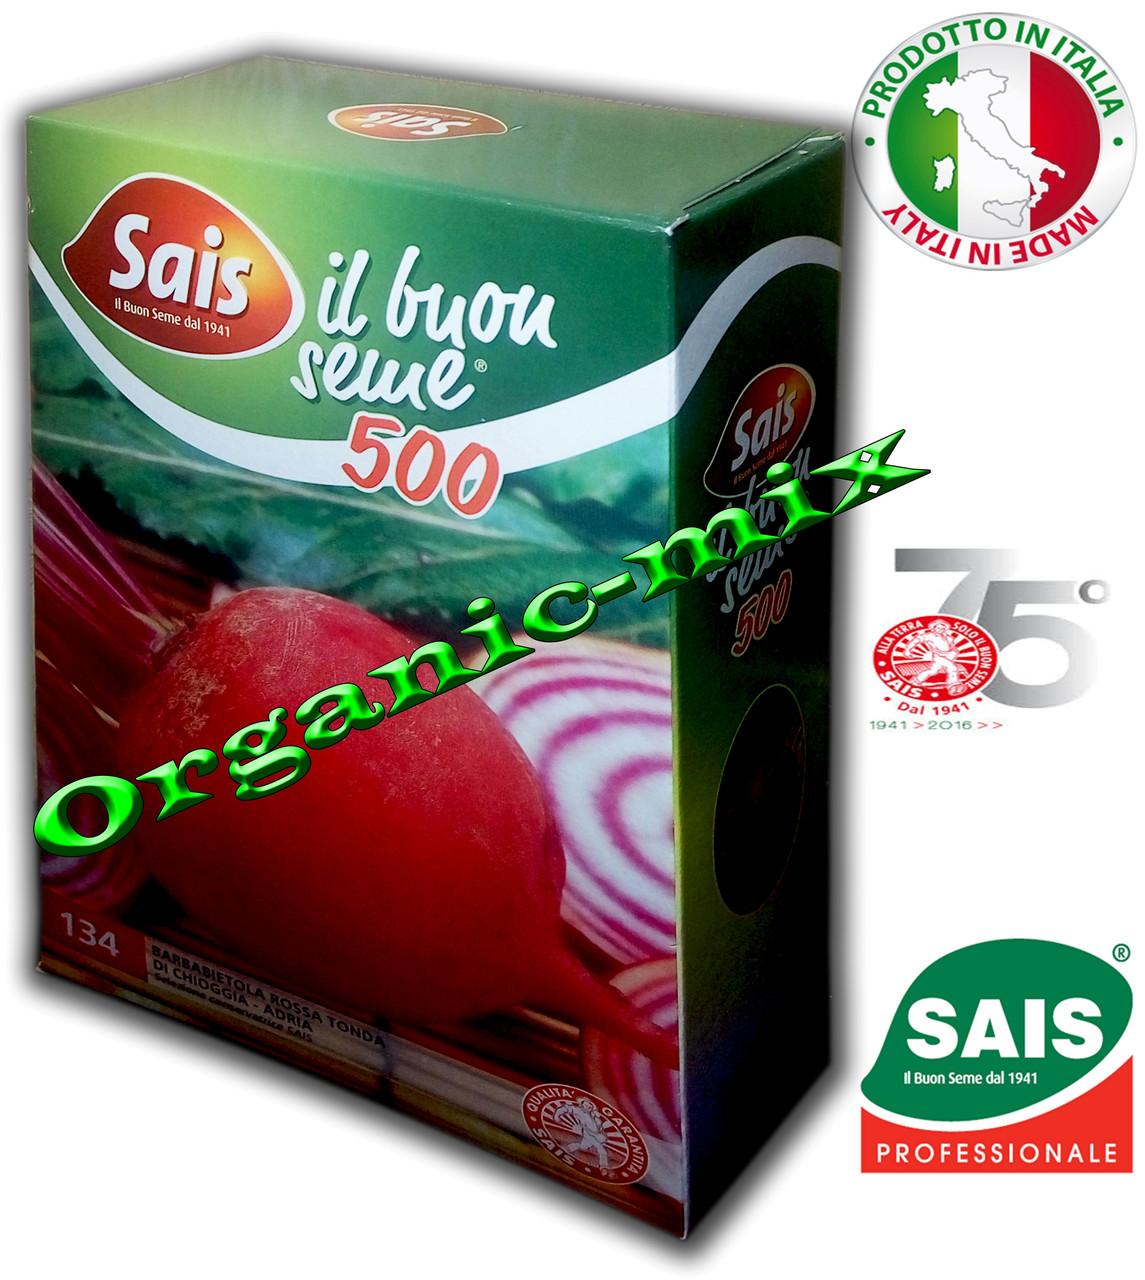 Семена, свекла борщевая Тонда ди Кежжа / tonda di chioggia, ТМ Sais (Италия), коробка 500 грамм